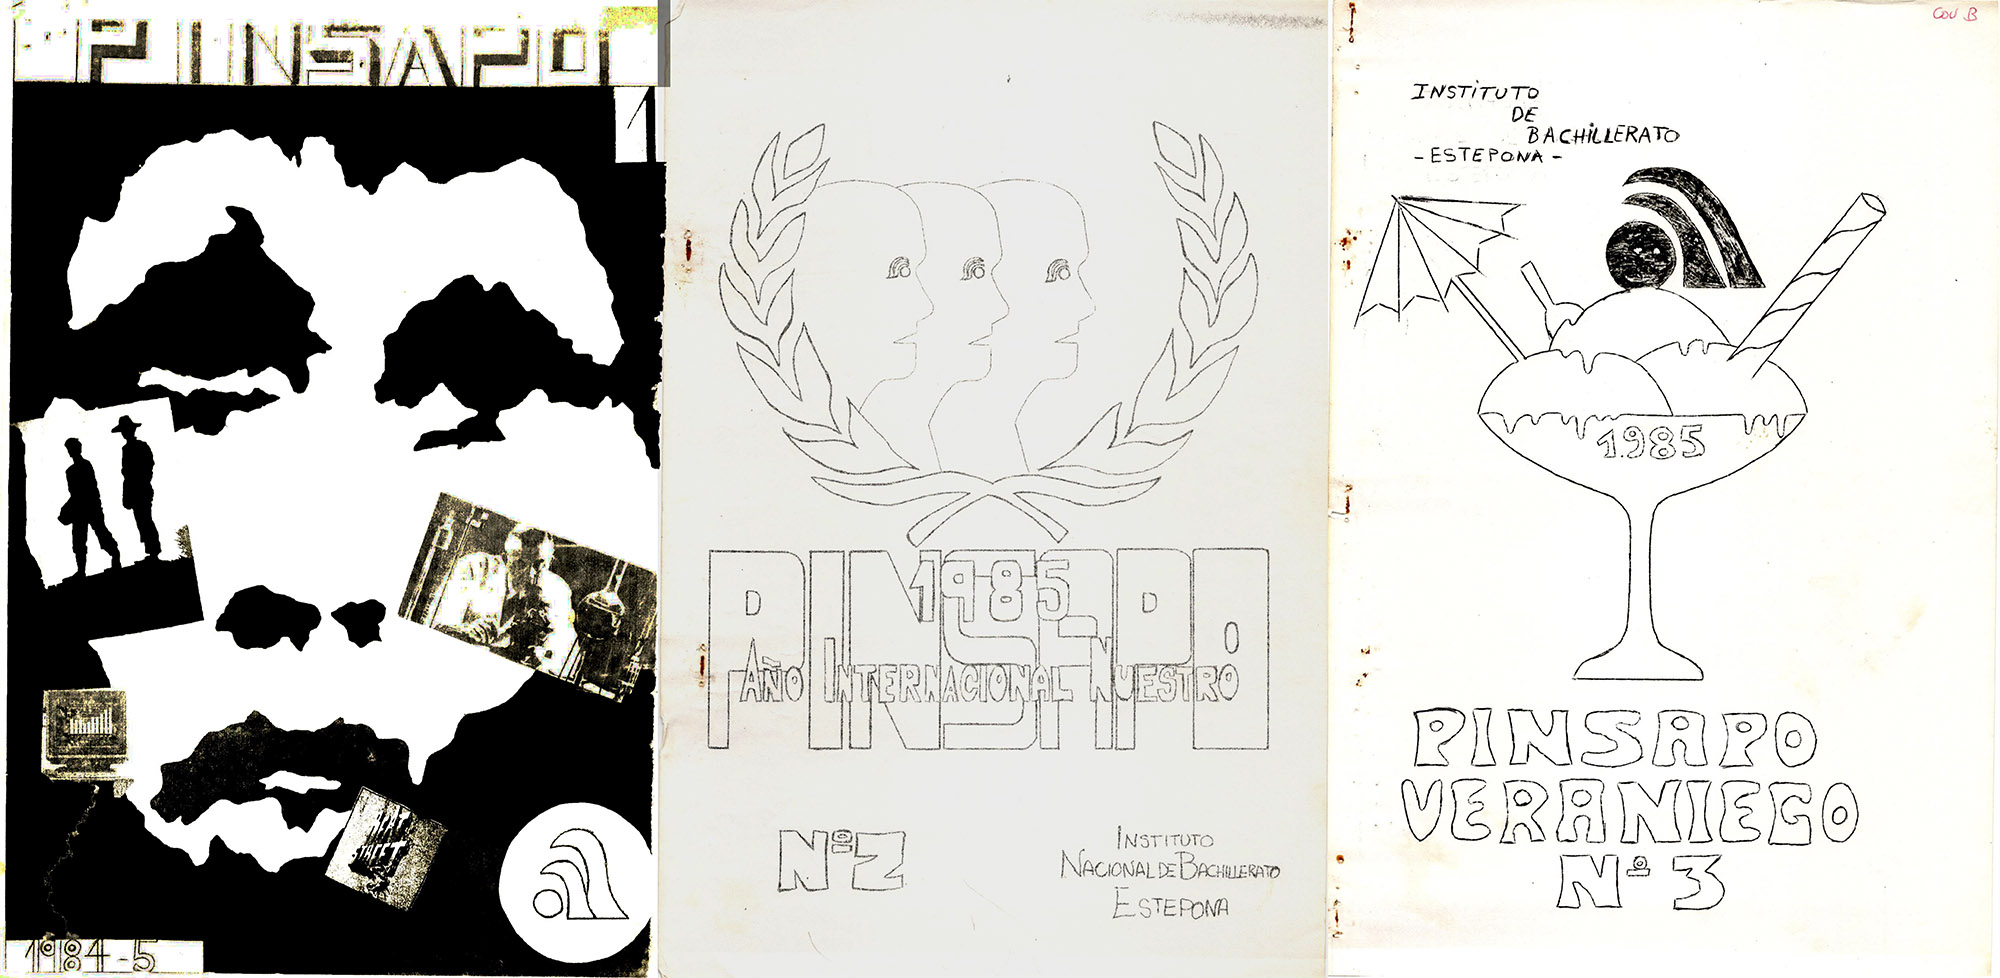 IES Monterroso de Estepona. Revista Pinsapo 1984-85